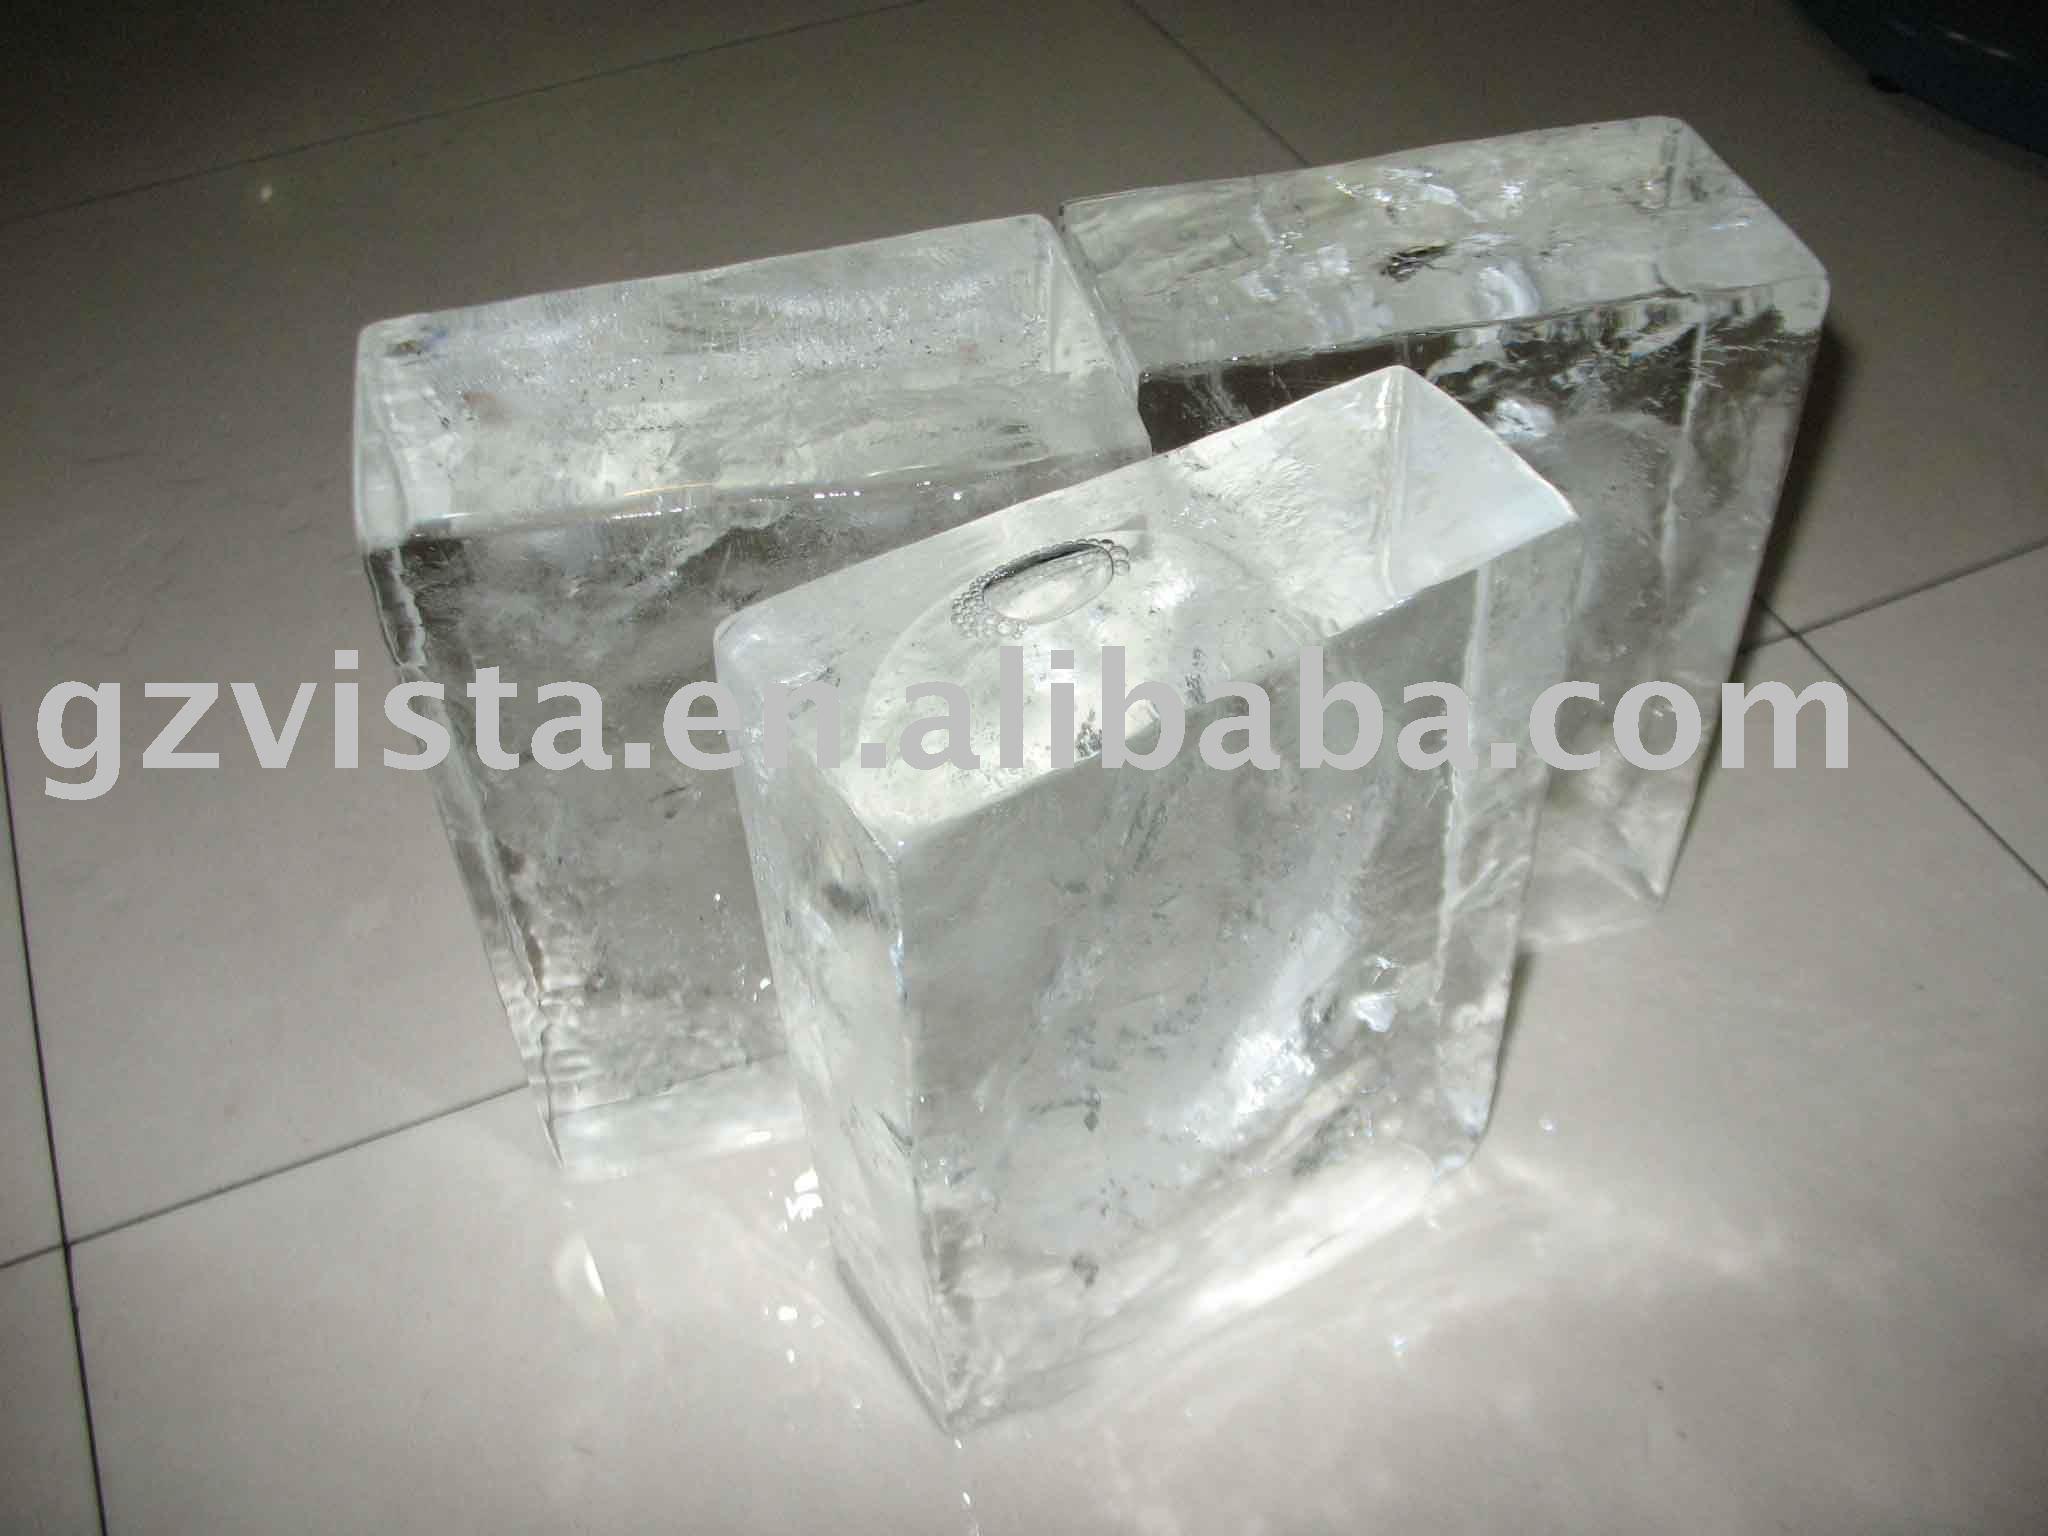 transparente de hielo fabricante de bloques Máquinas de hielo  #3E3C31